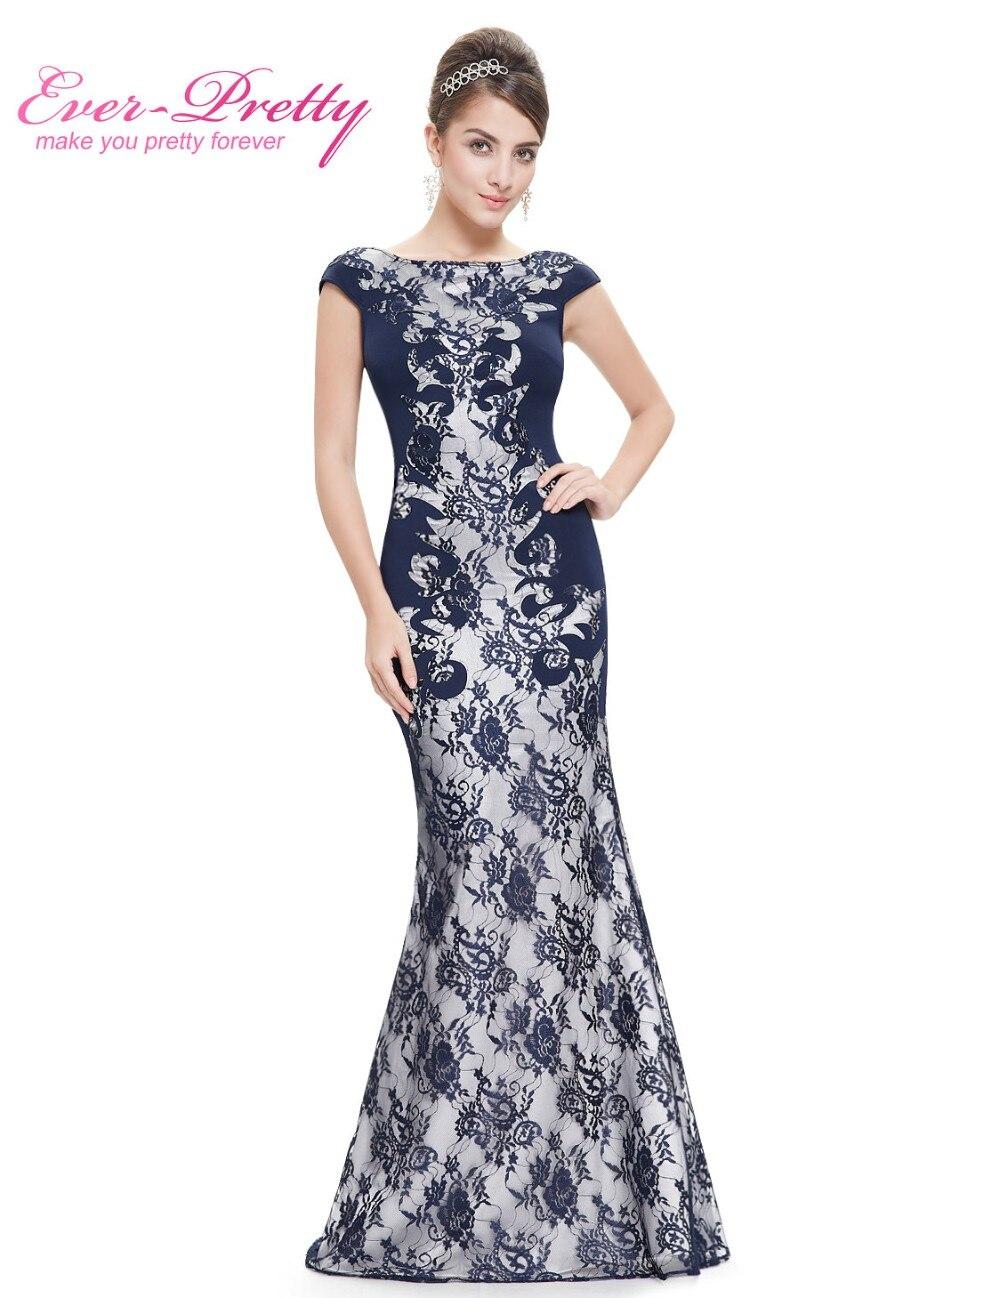 Black lace dress in pretty woman